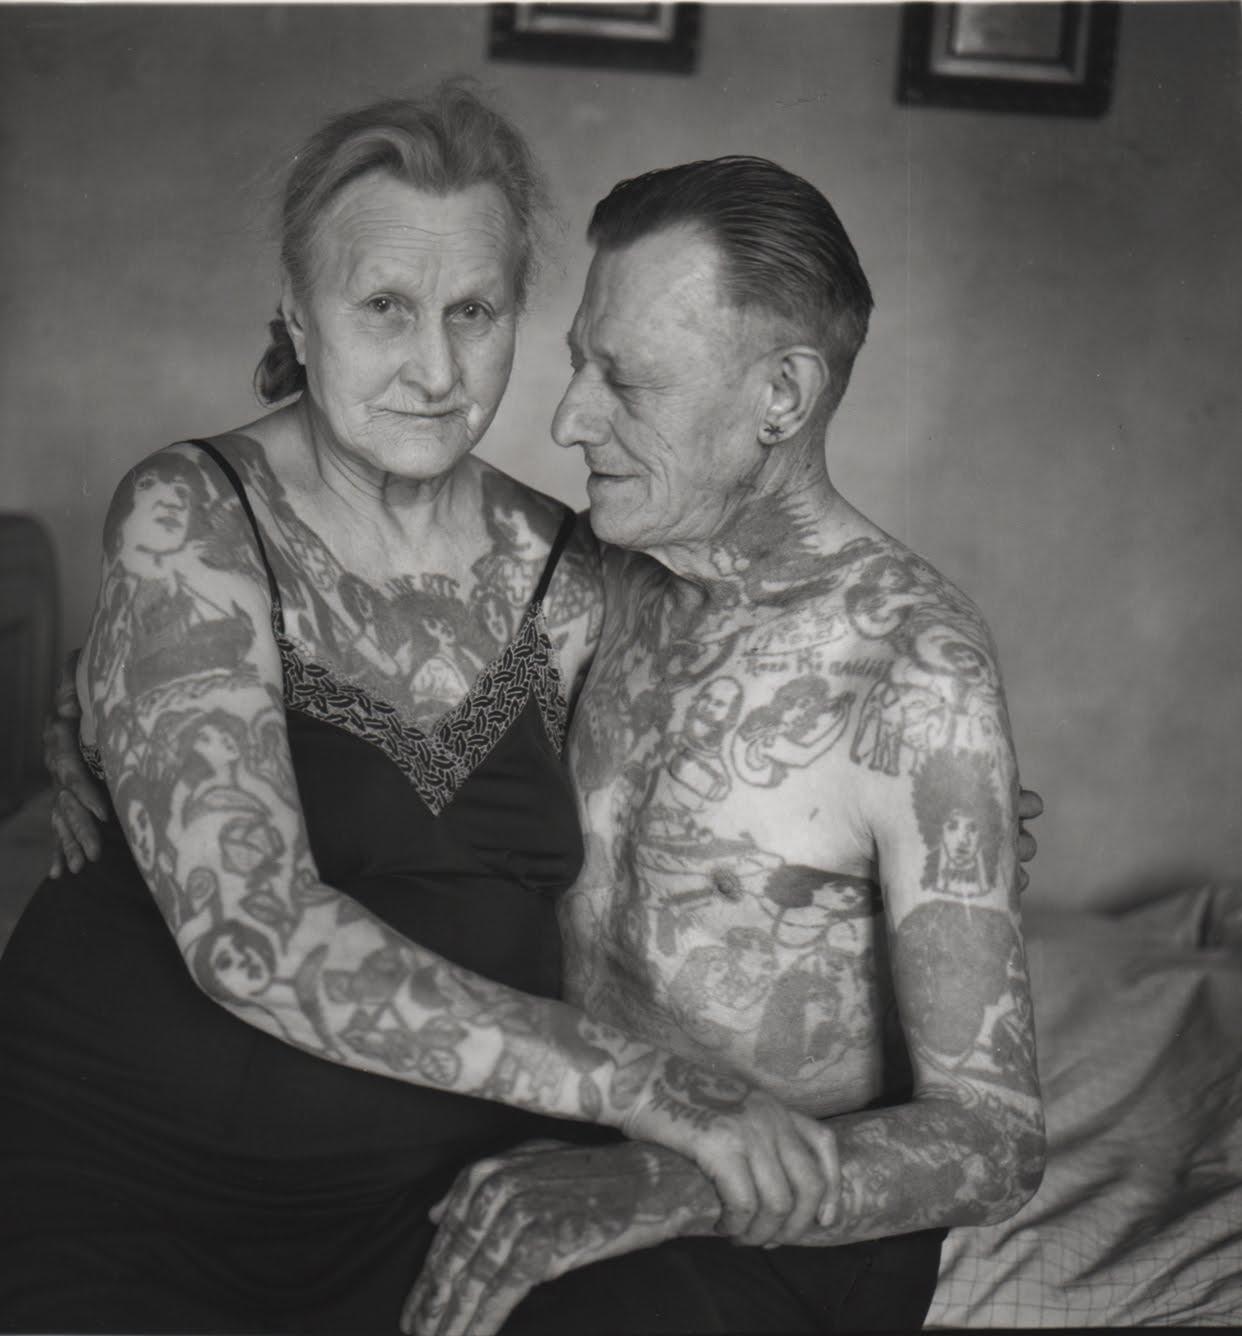 Старик трахає молоду фото 26 фотография